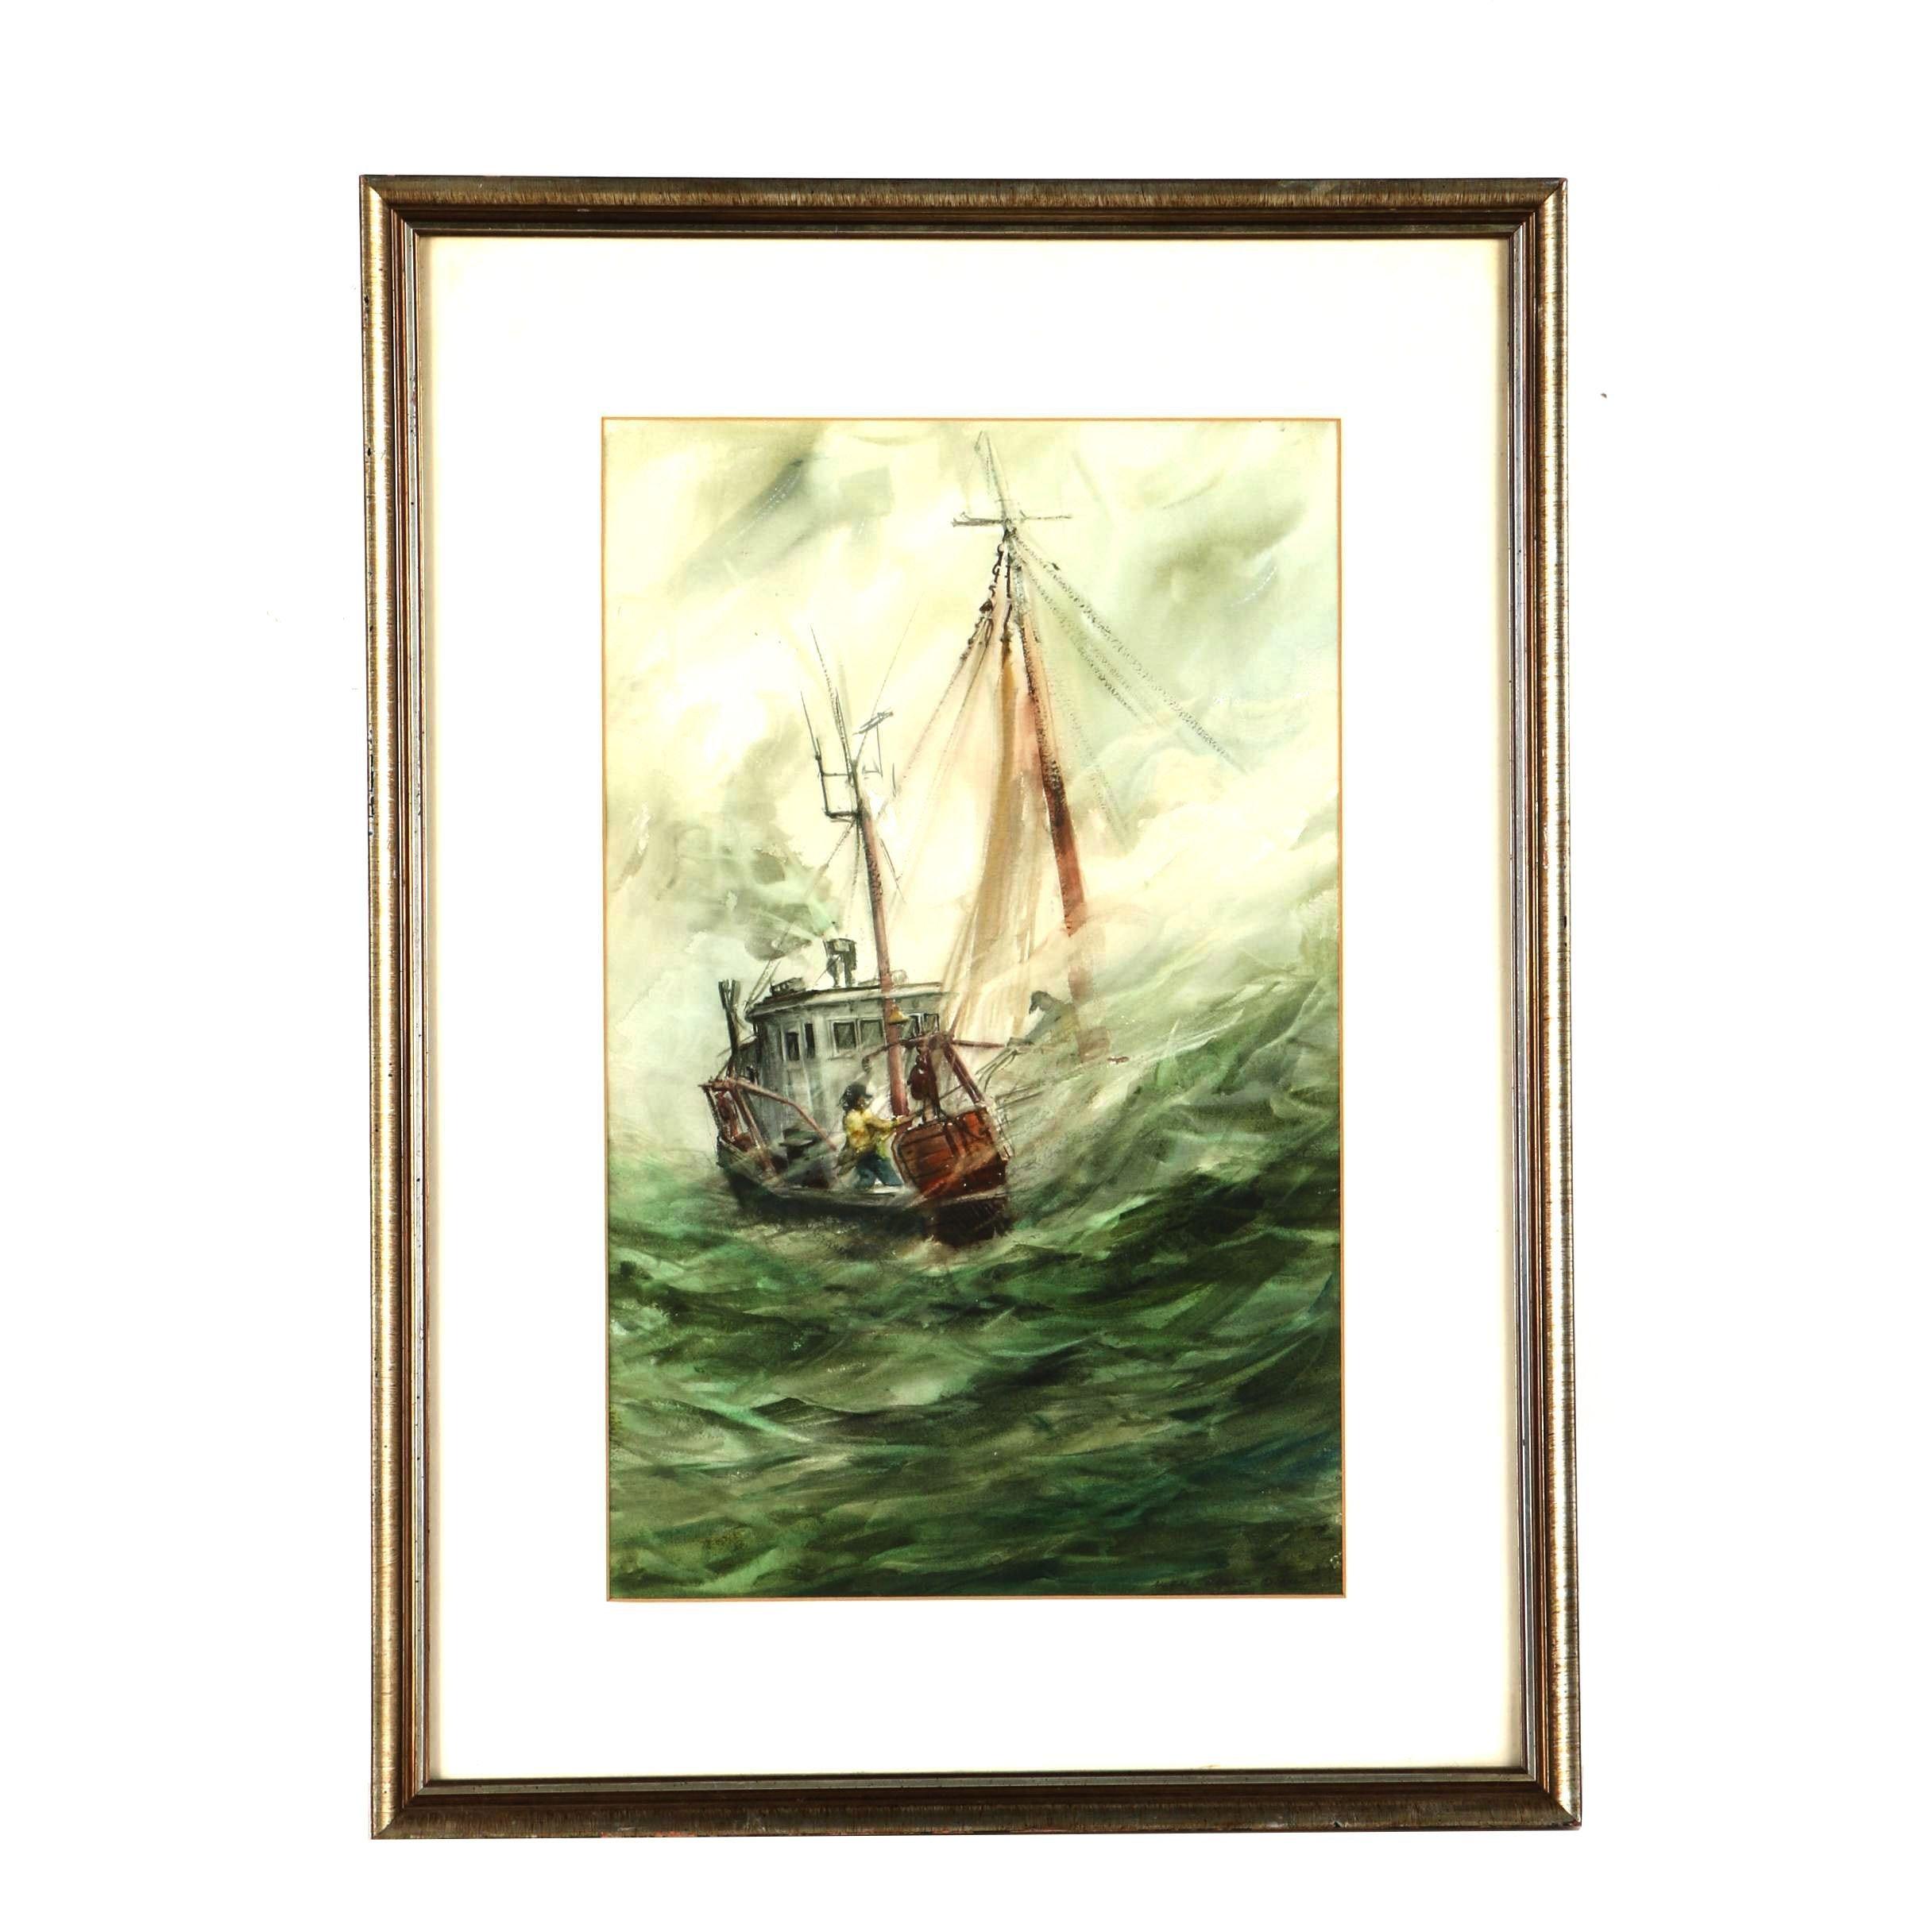 Allen Hawks Watercolor on Paper of a Boat in a Storm